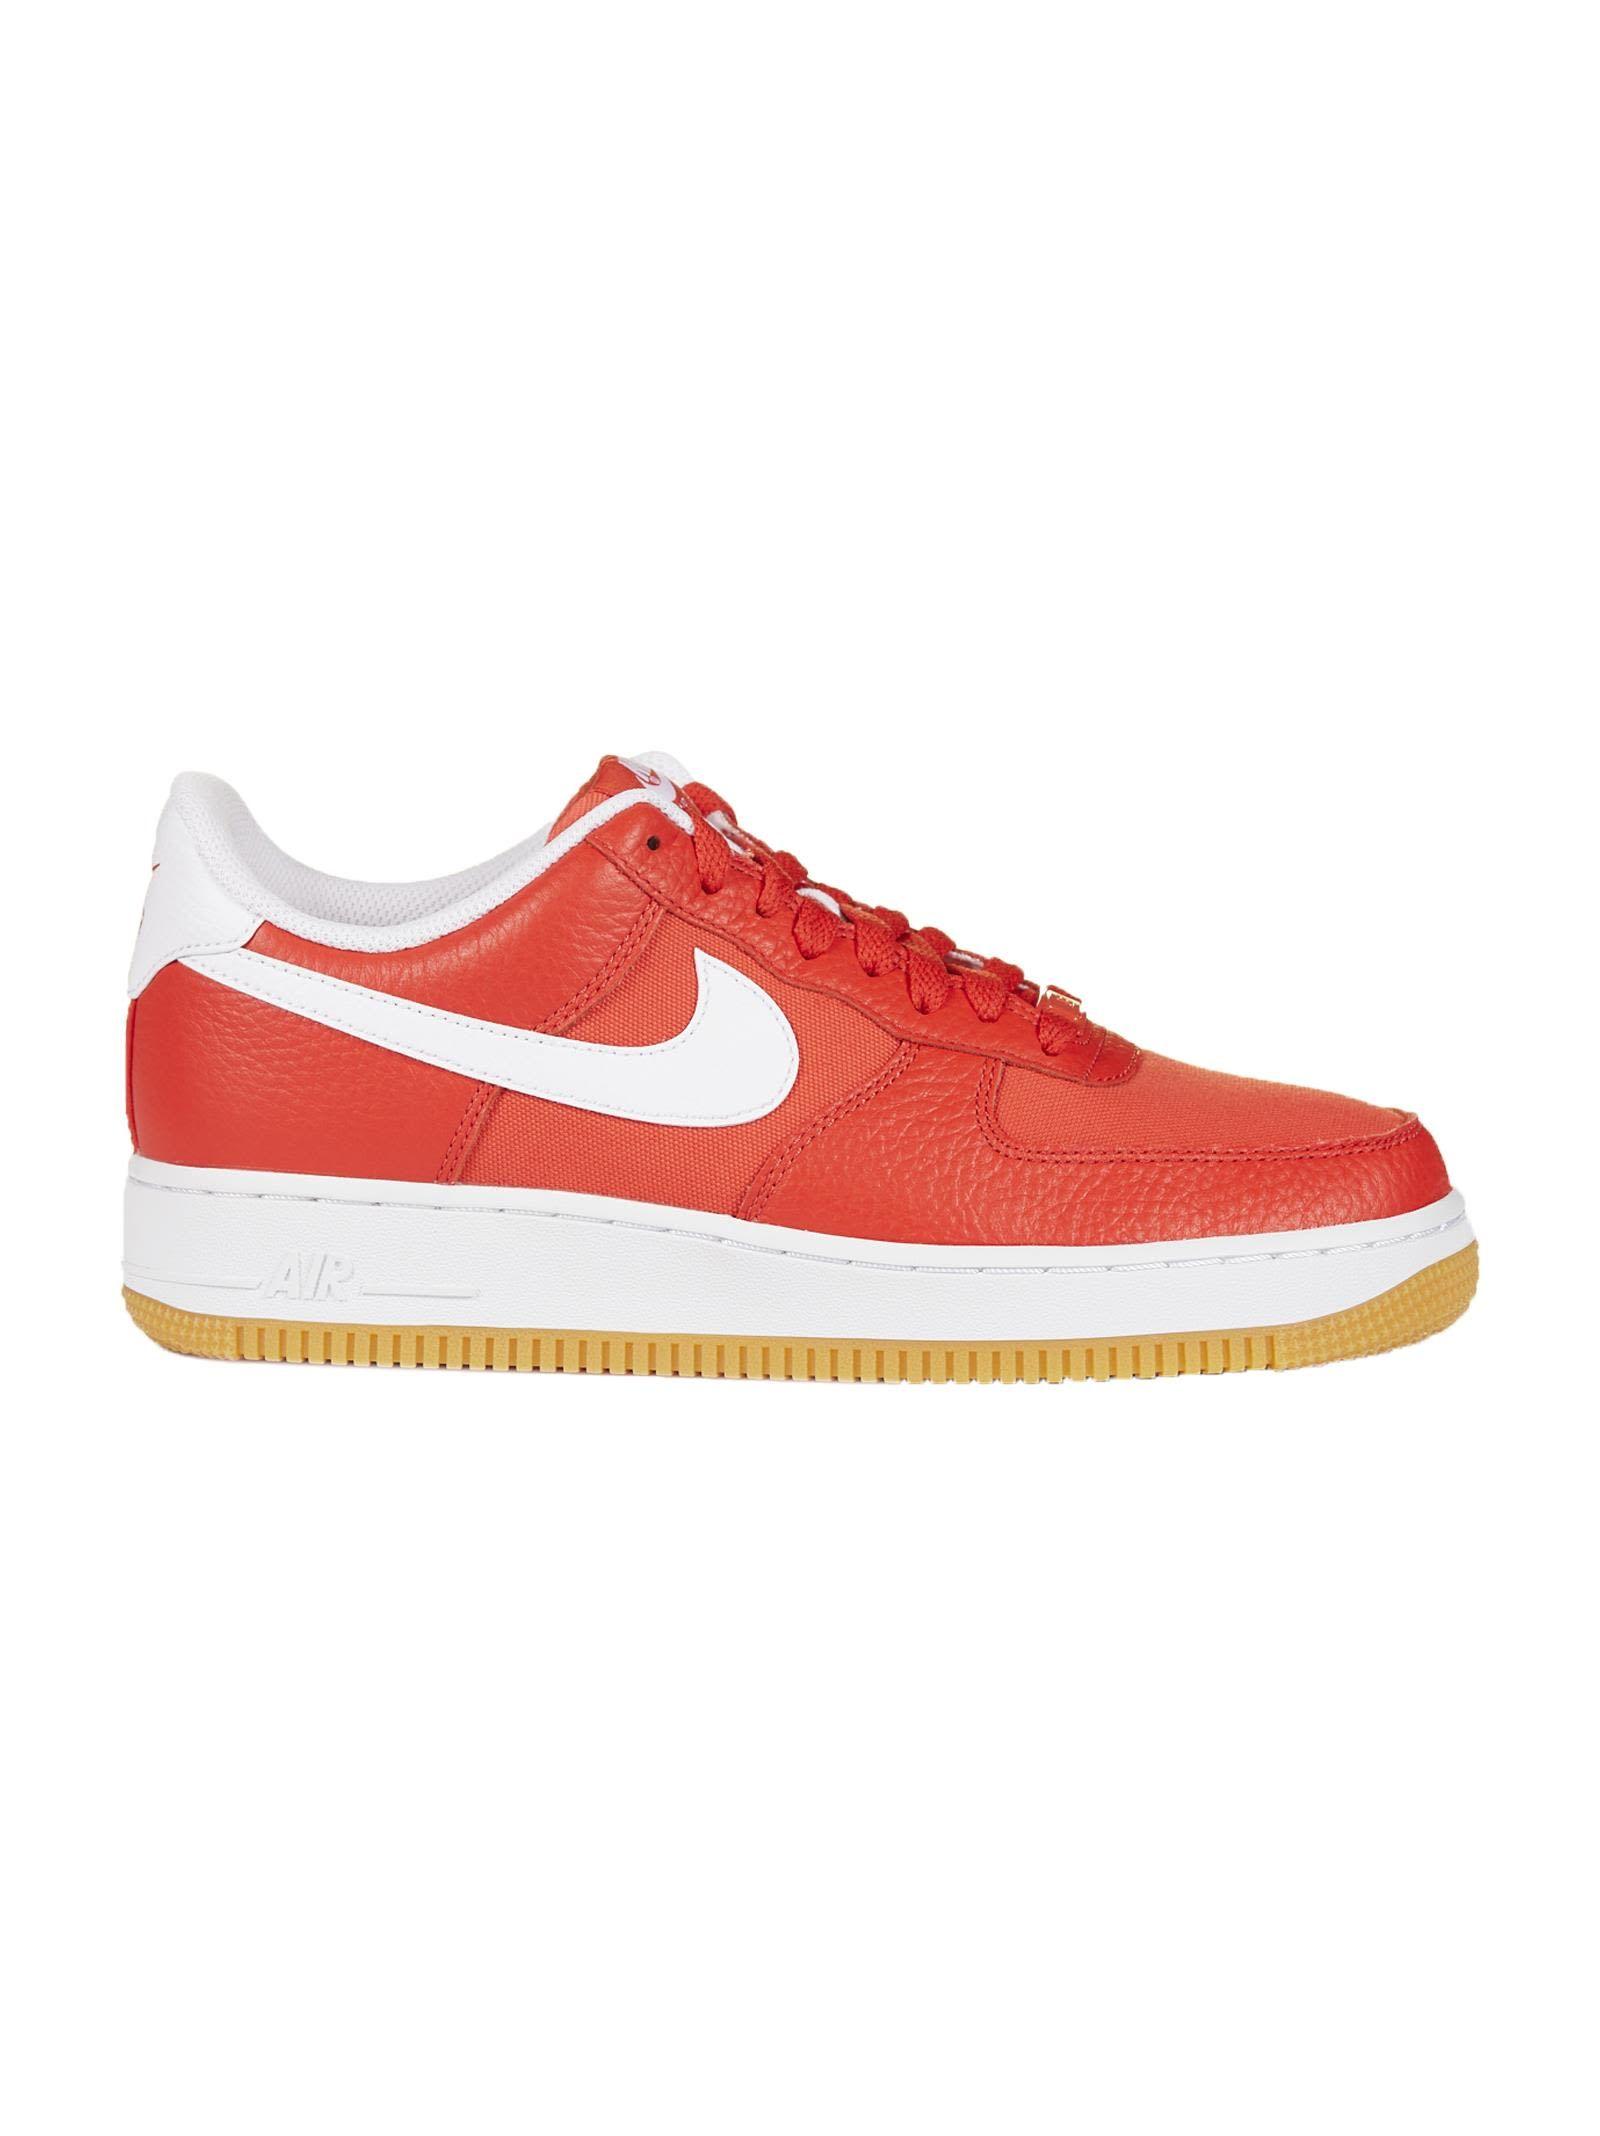 NIKE | Nike Nike Air Force 1 Sneakers #Shoes #Sneakers #NIKE